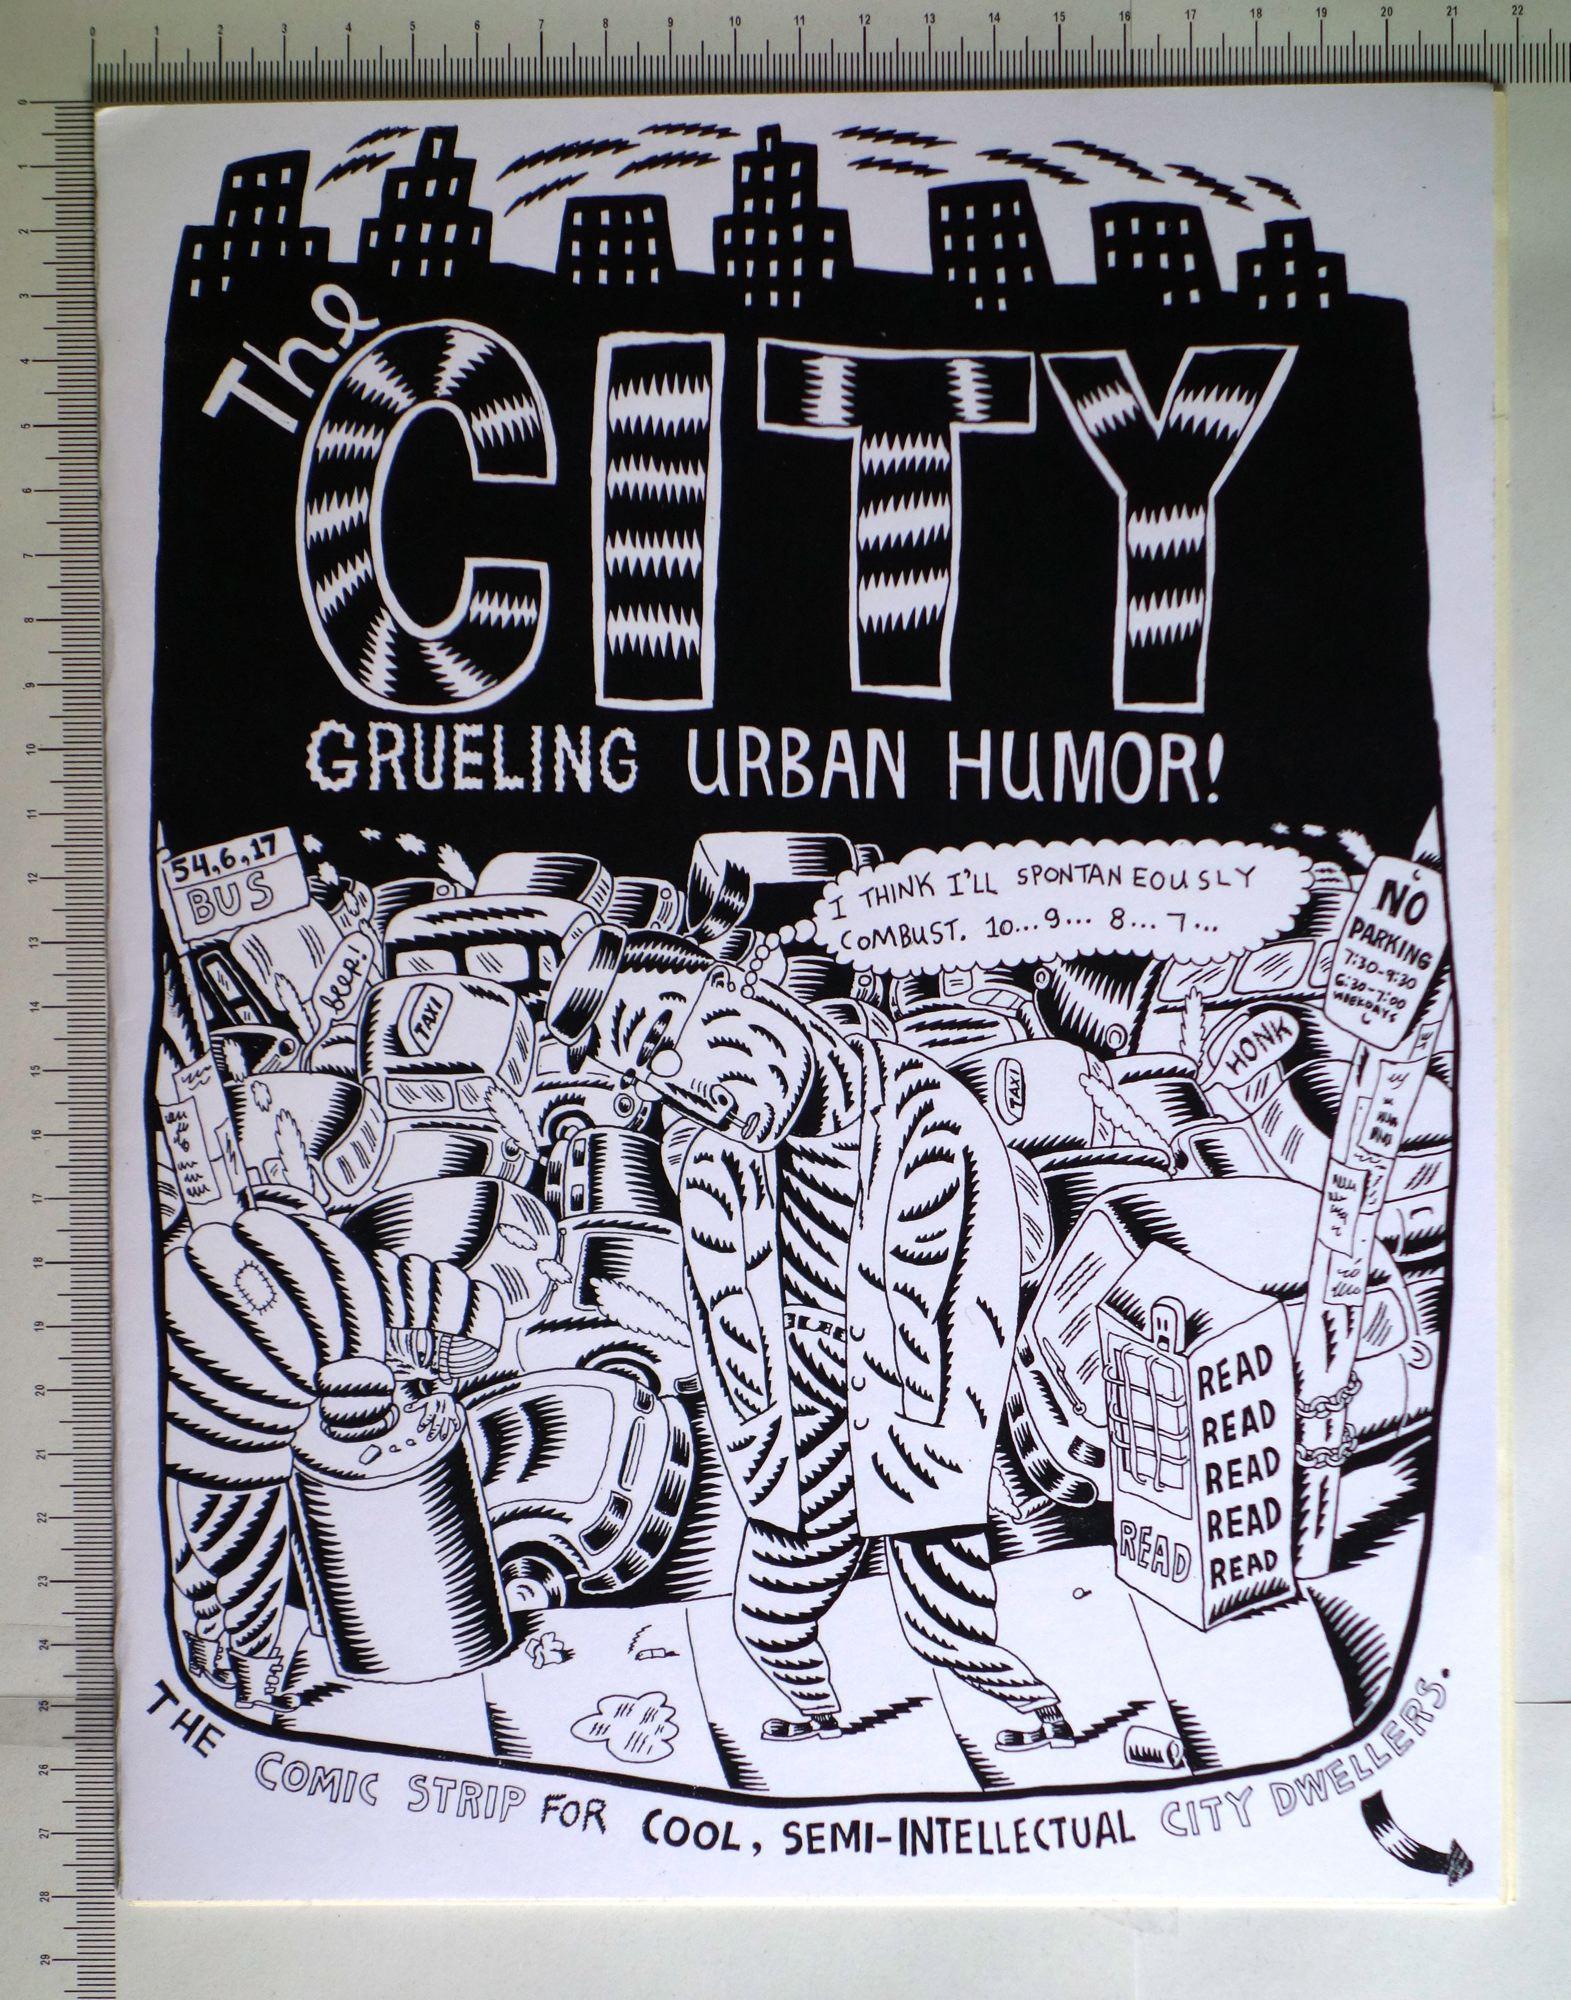 The city, fanzine